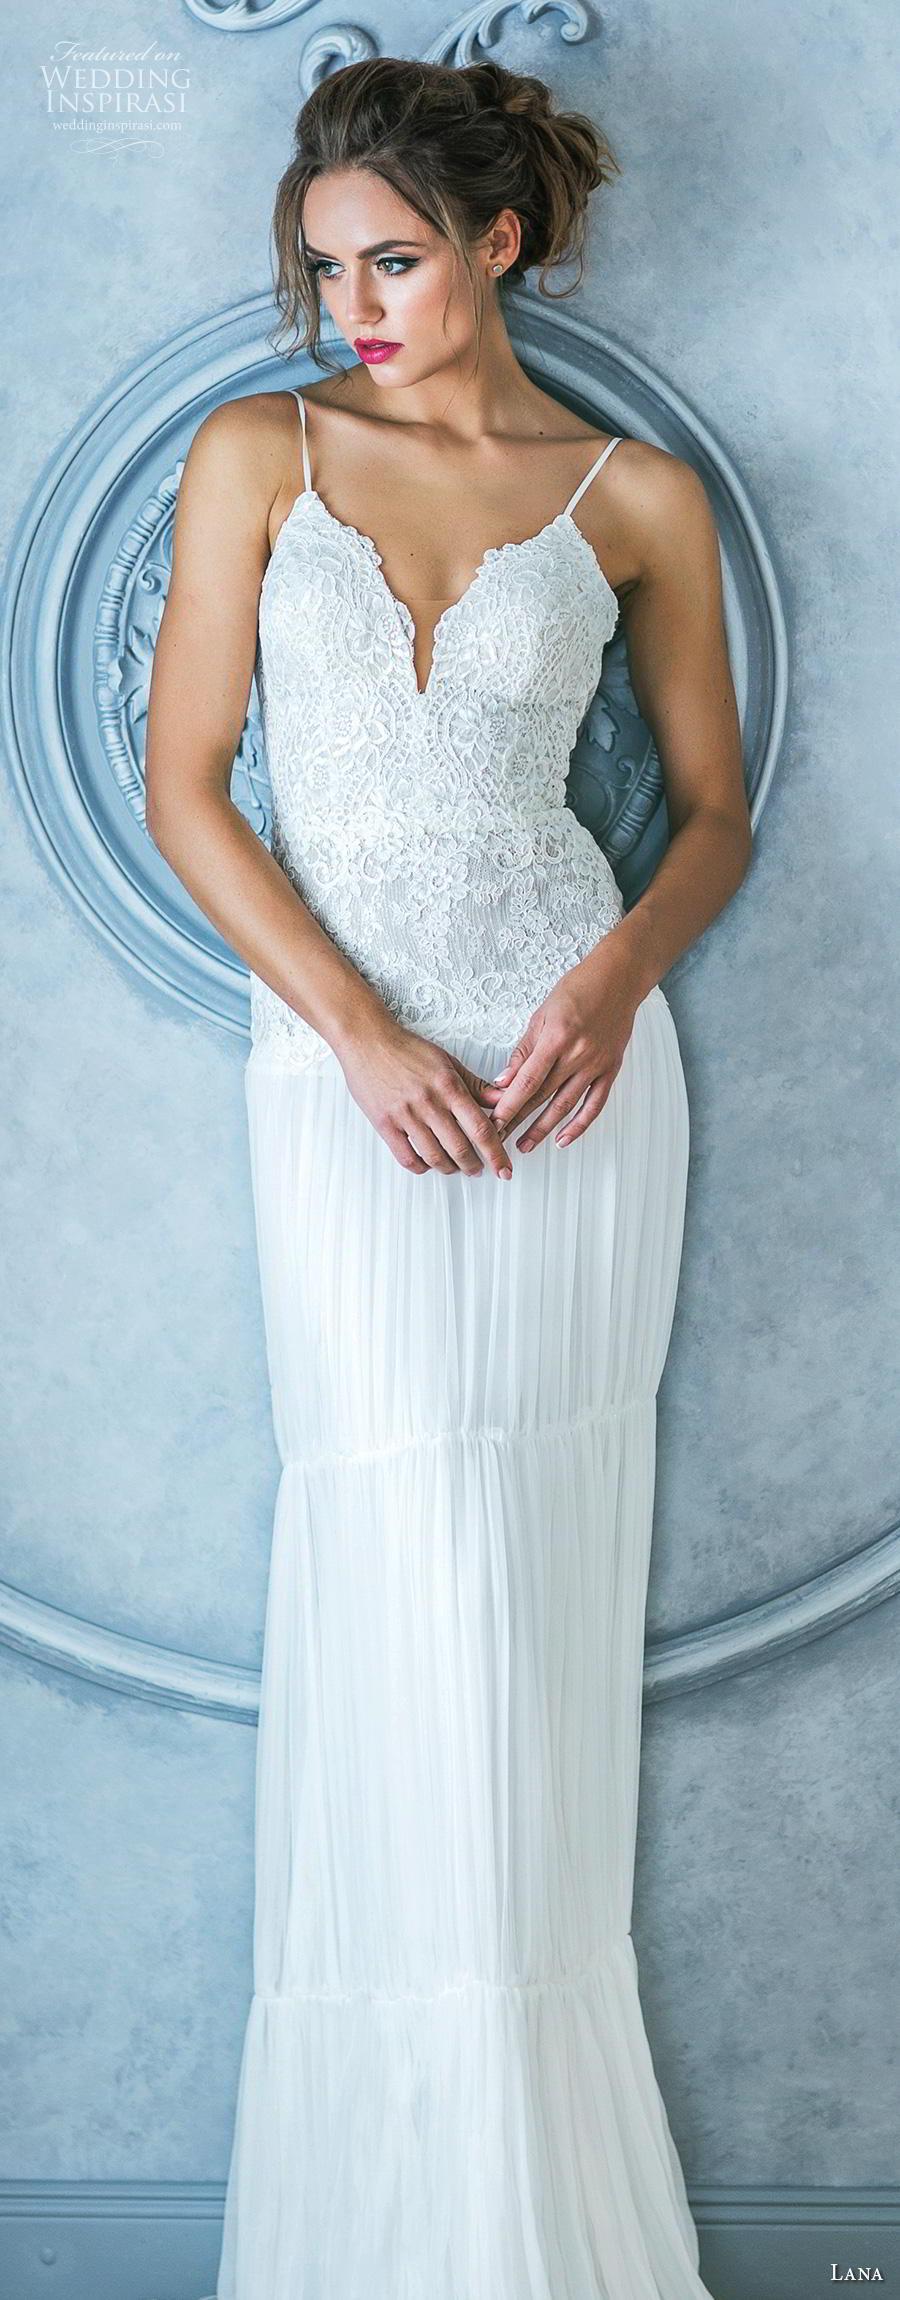 lana 2018 bridal spaghetti strap deep plunging sweetheart neckline heavily embellished bodice romantic sheath wedding dress backless v back sweep train (5) lv